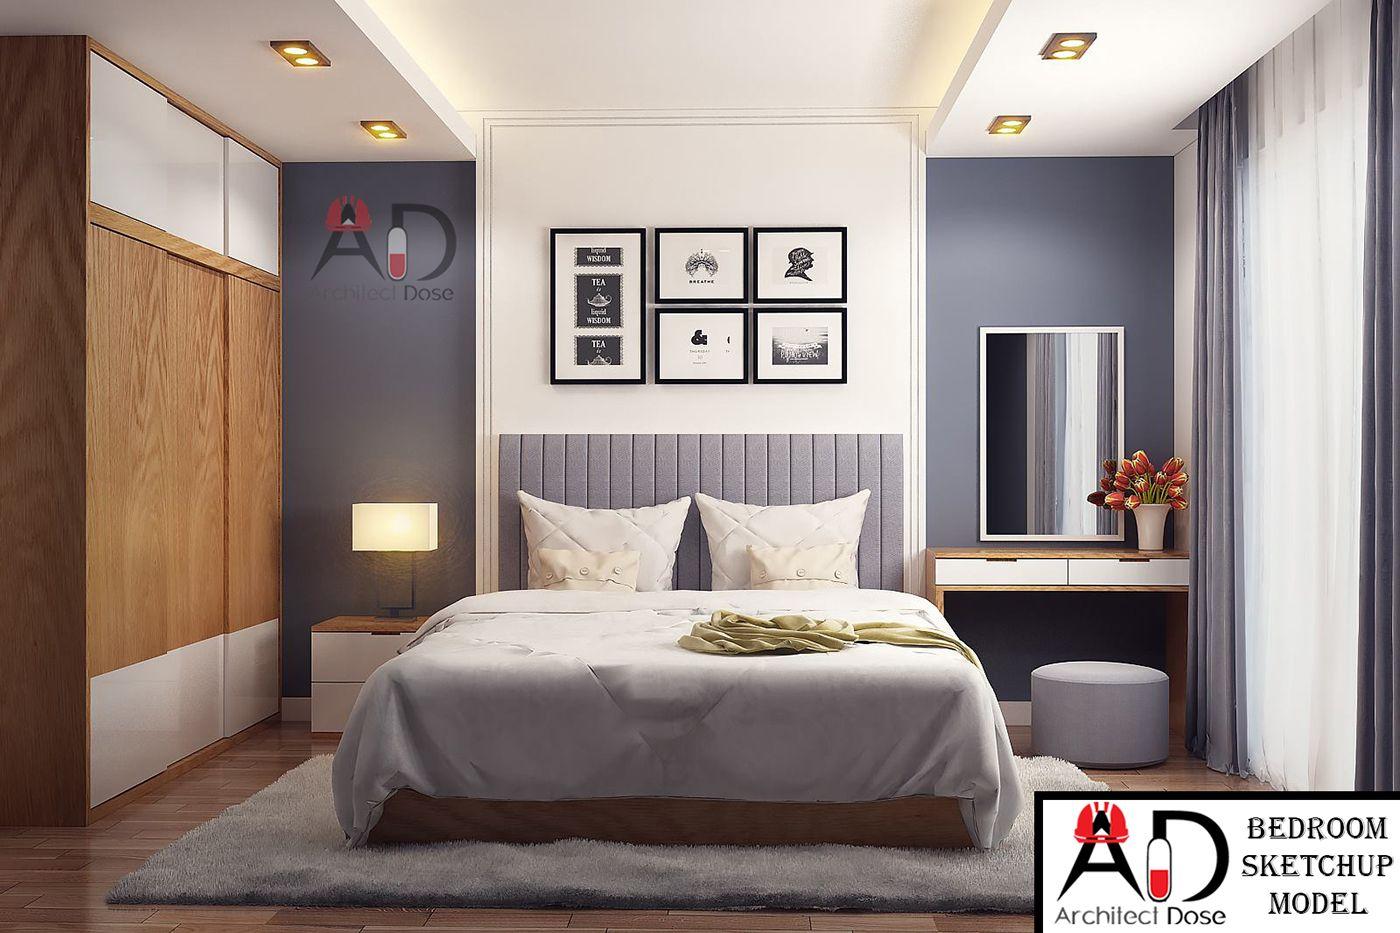 Bedroom Sketchup Model on Behance | Modern bedroom ...